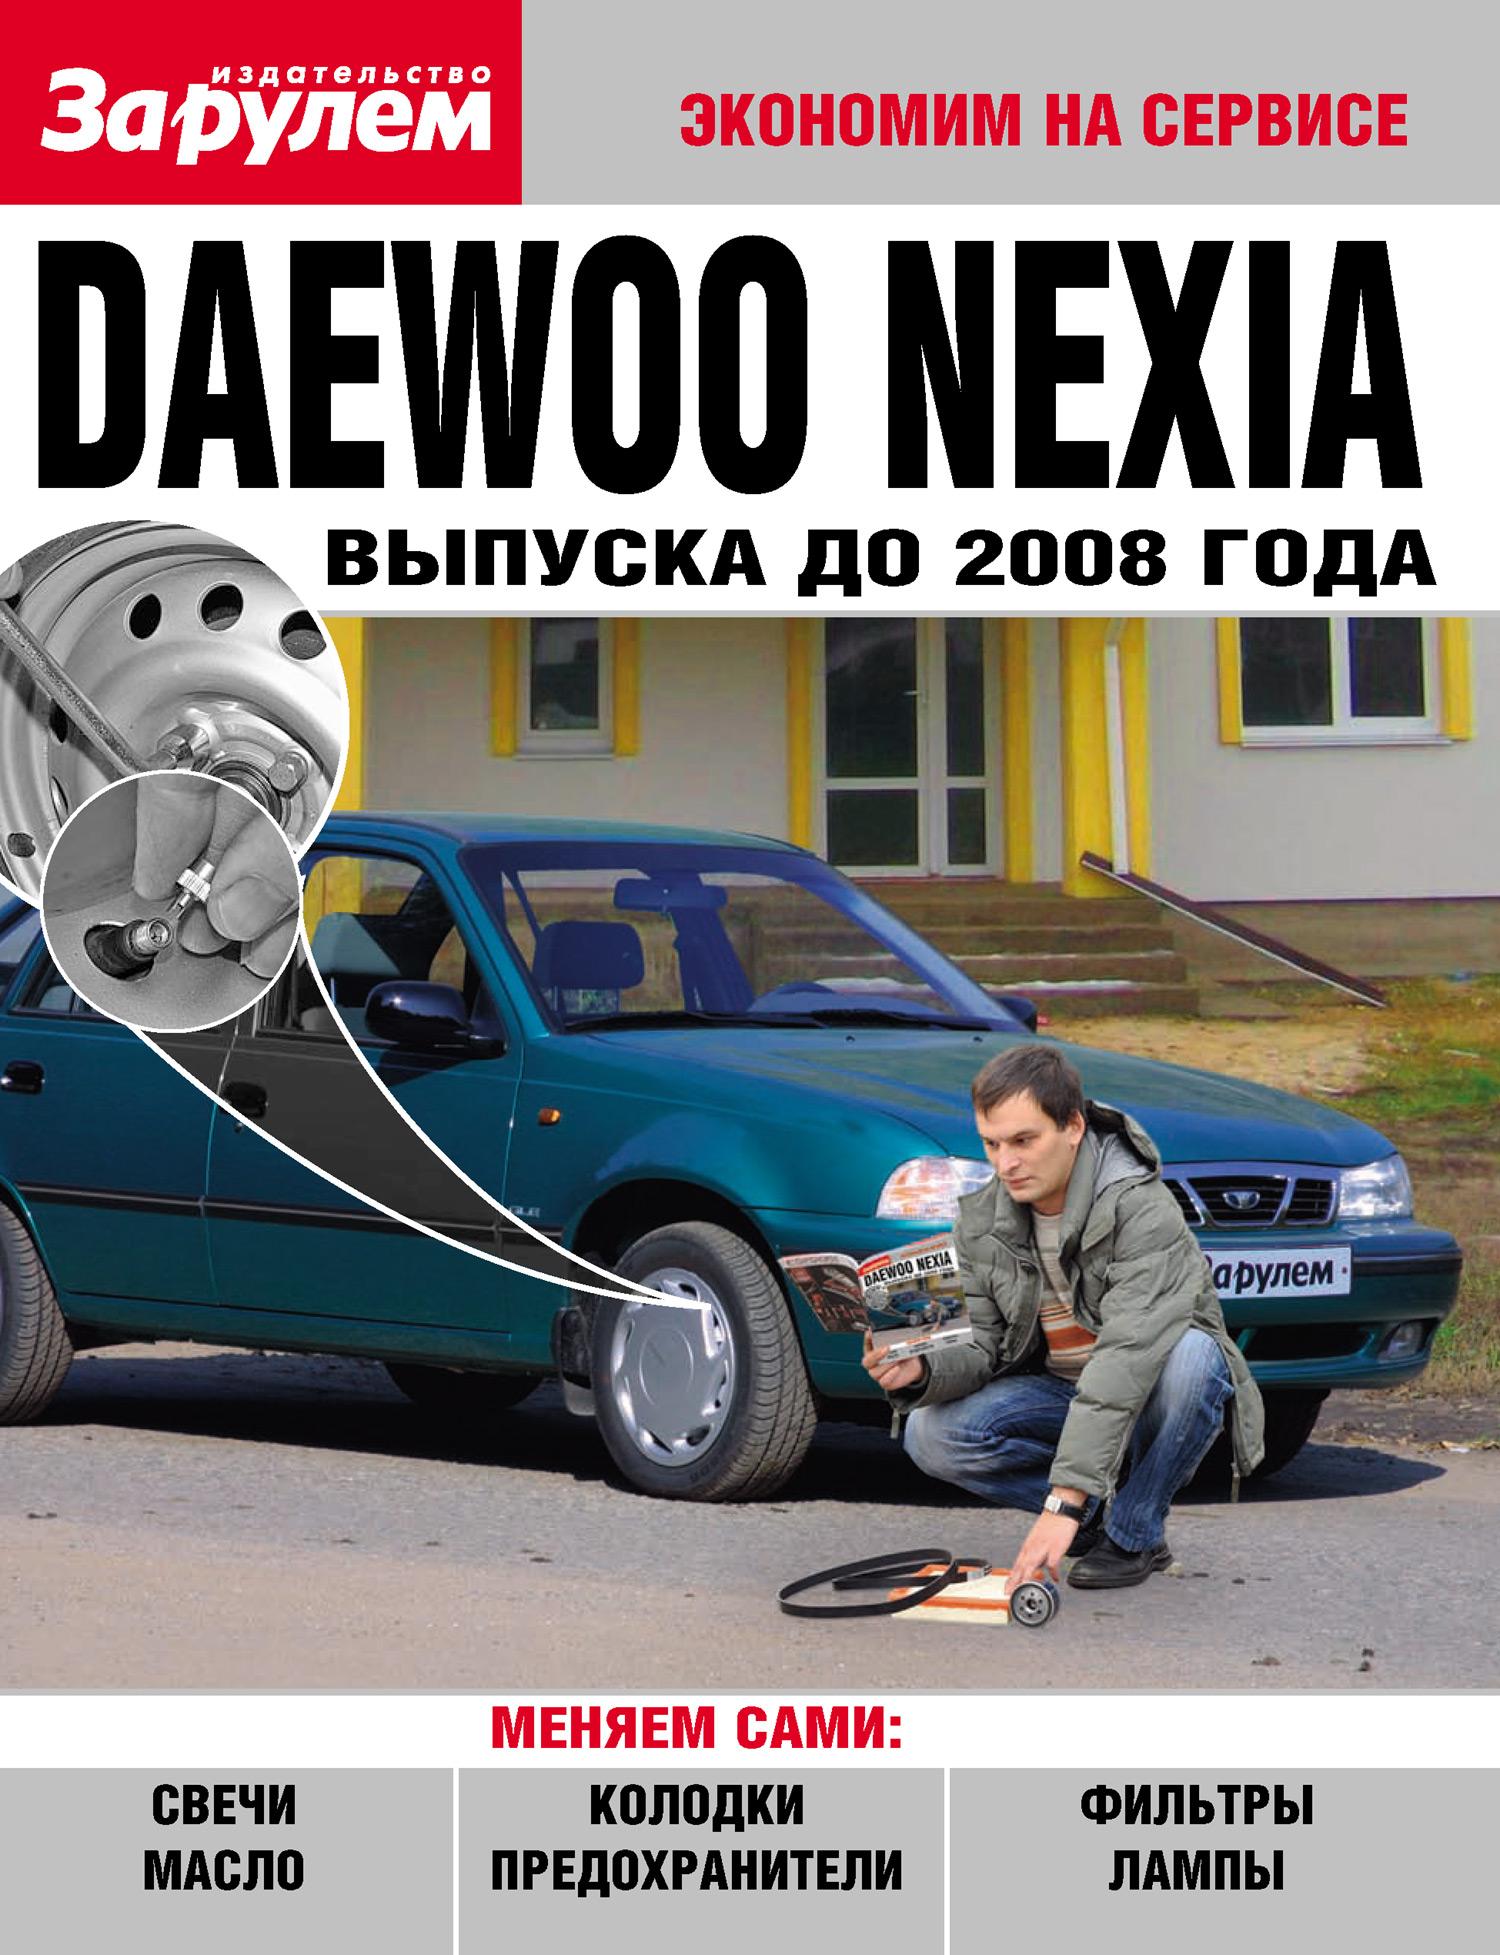 Отсутствует Daewoo Nexia выпуска до 2008 года отсутствует daewoo nexia выпуска до 2008 года